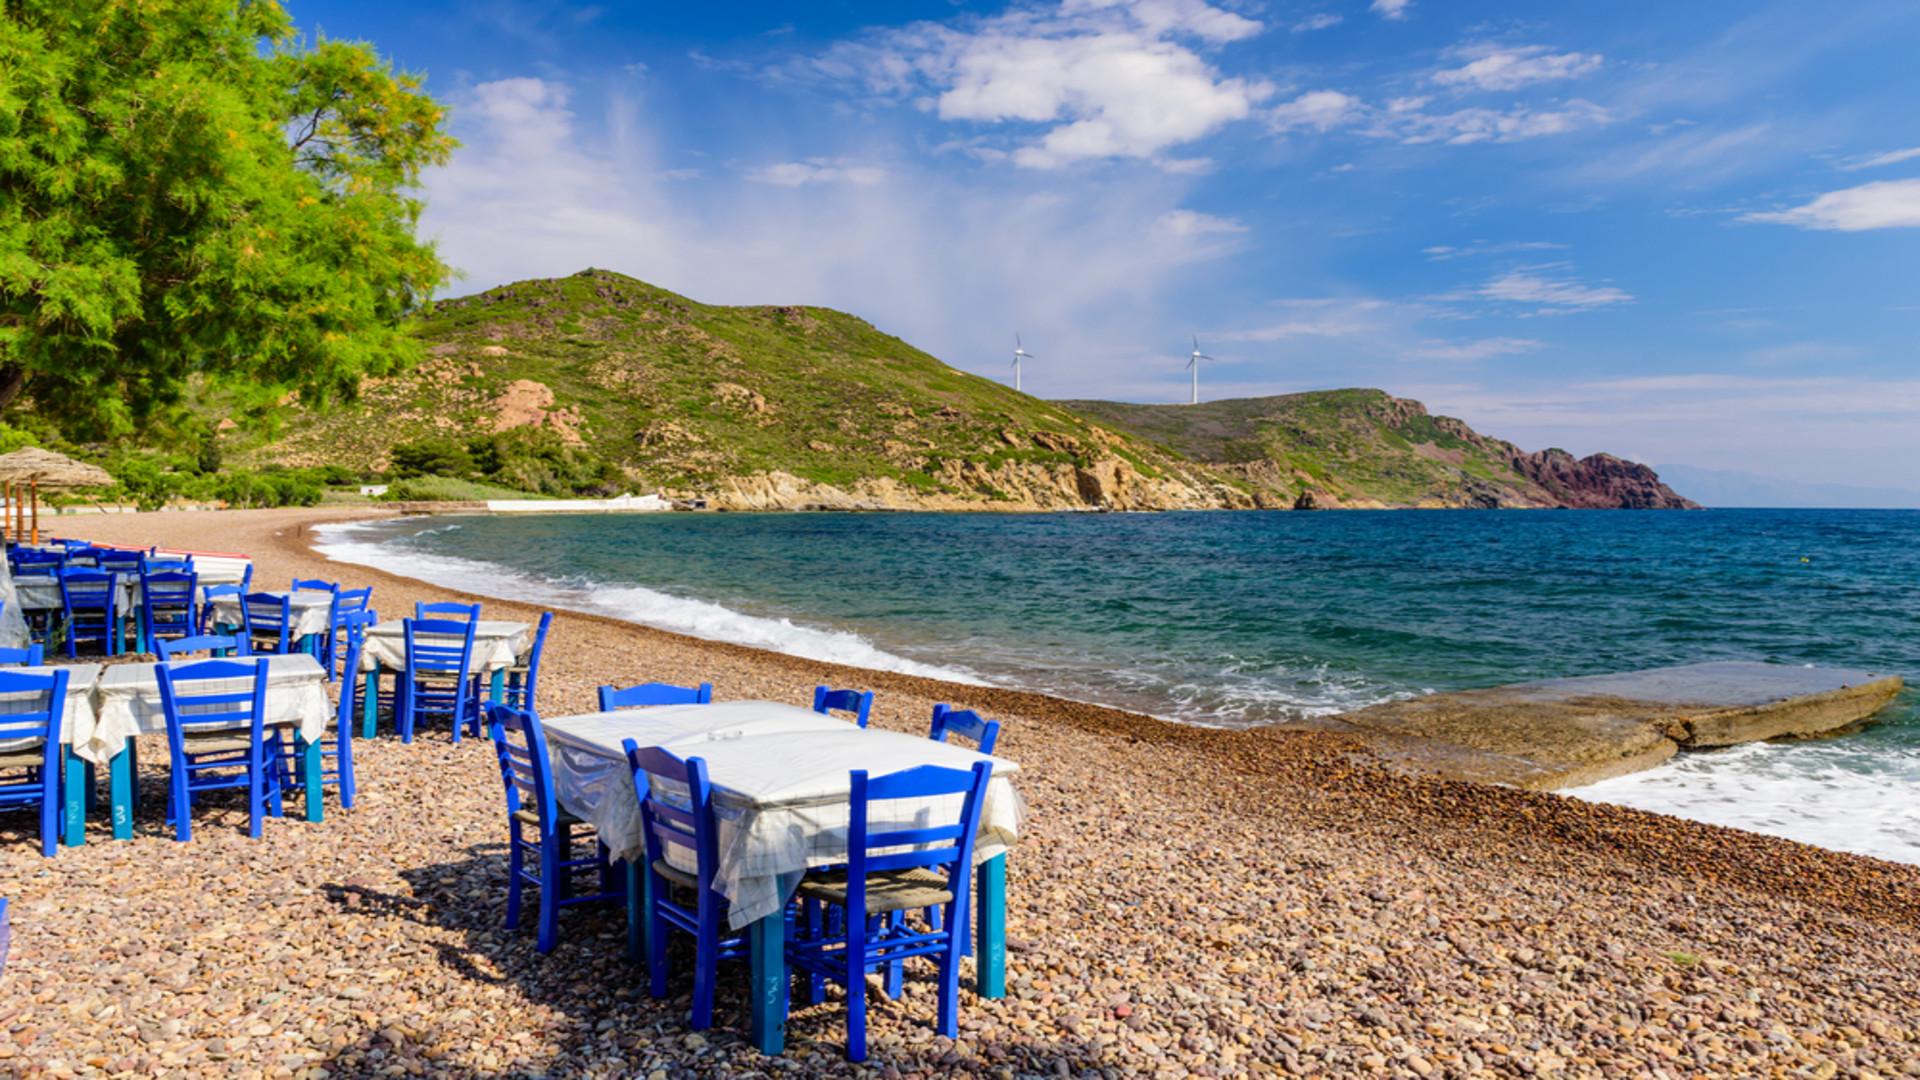 Traditionele Griekse taverne op Lambi beach, Patmos eiland, Dodecanese, Griekenland